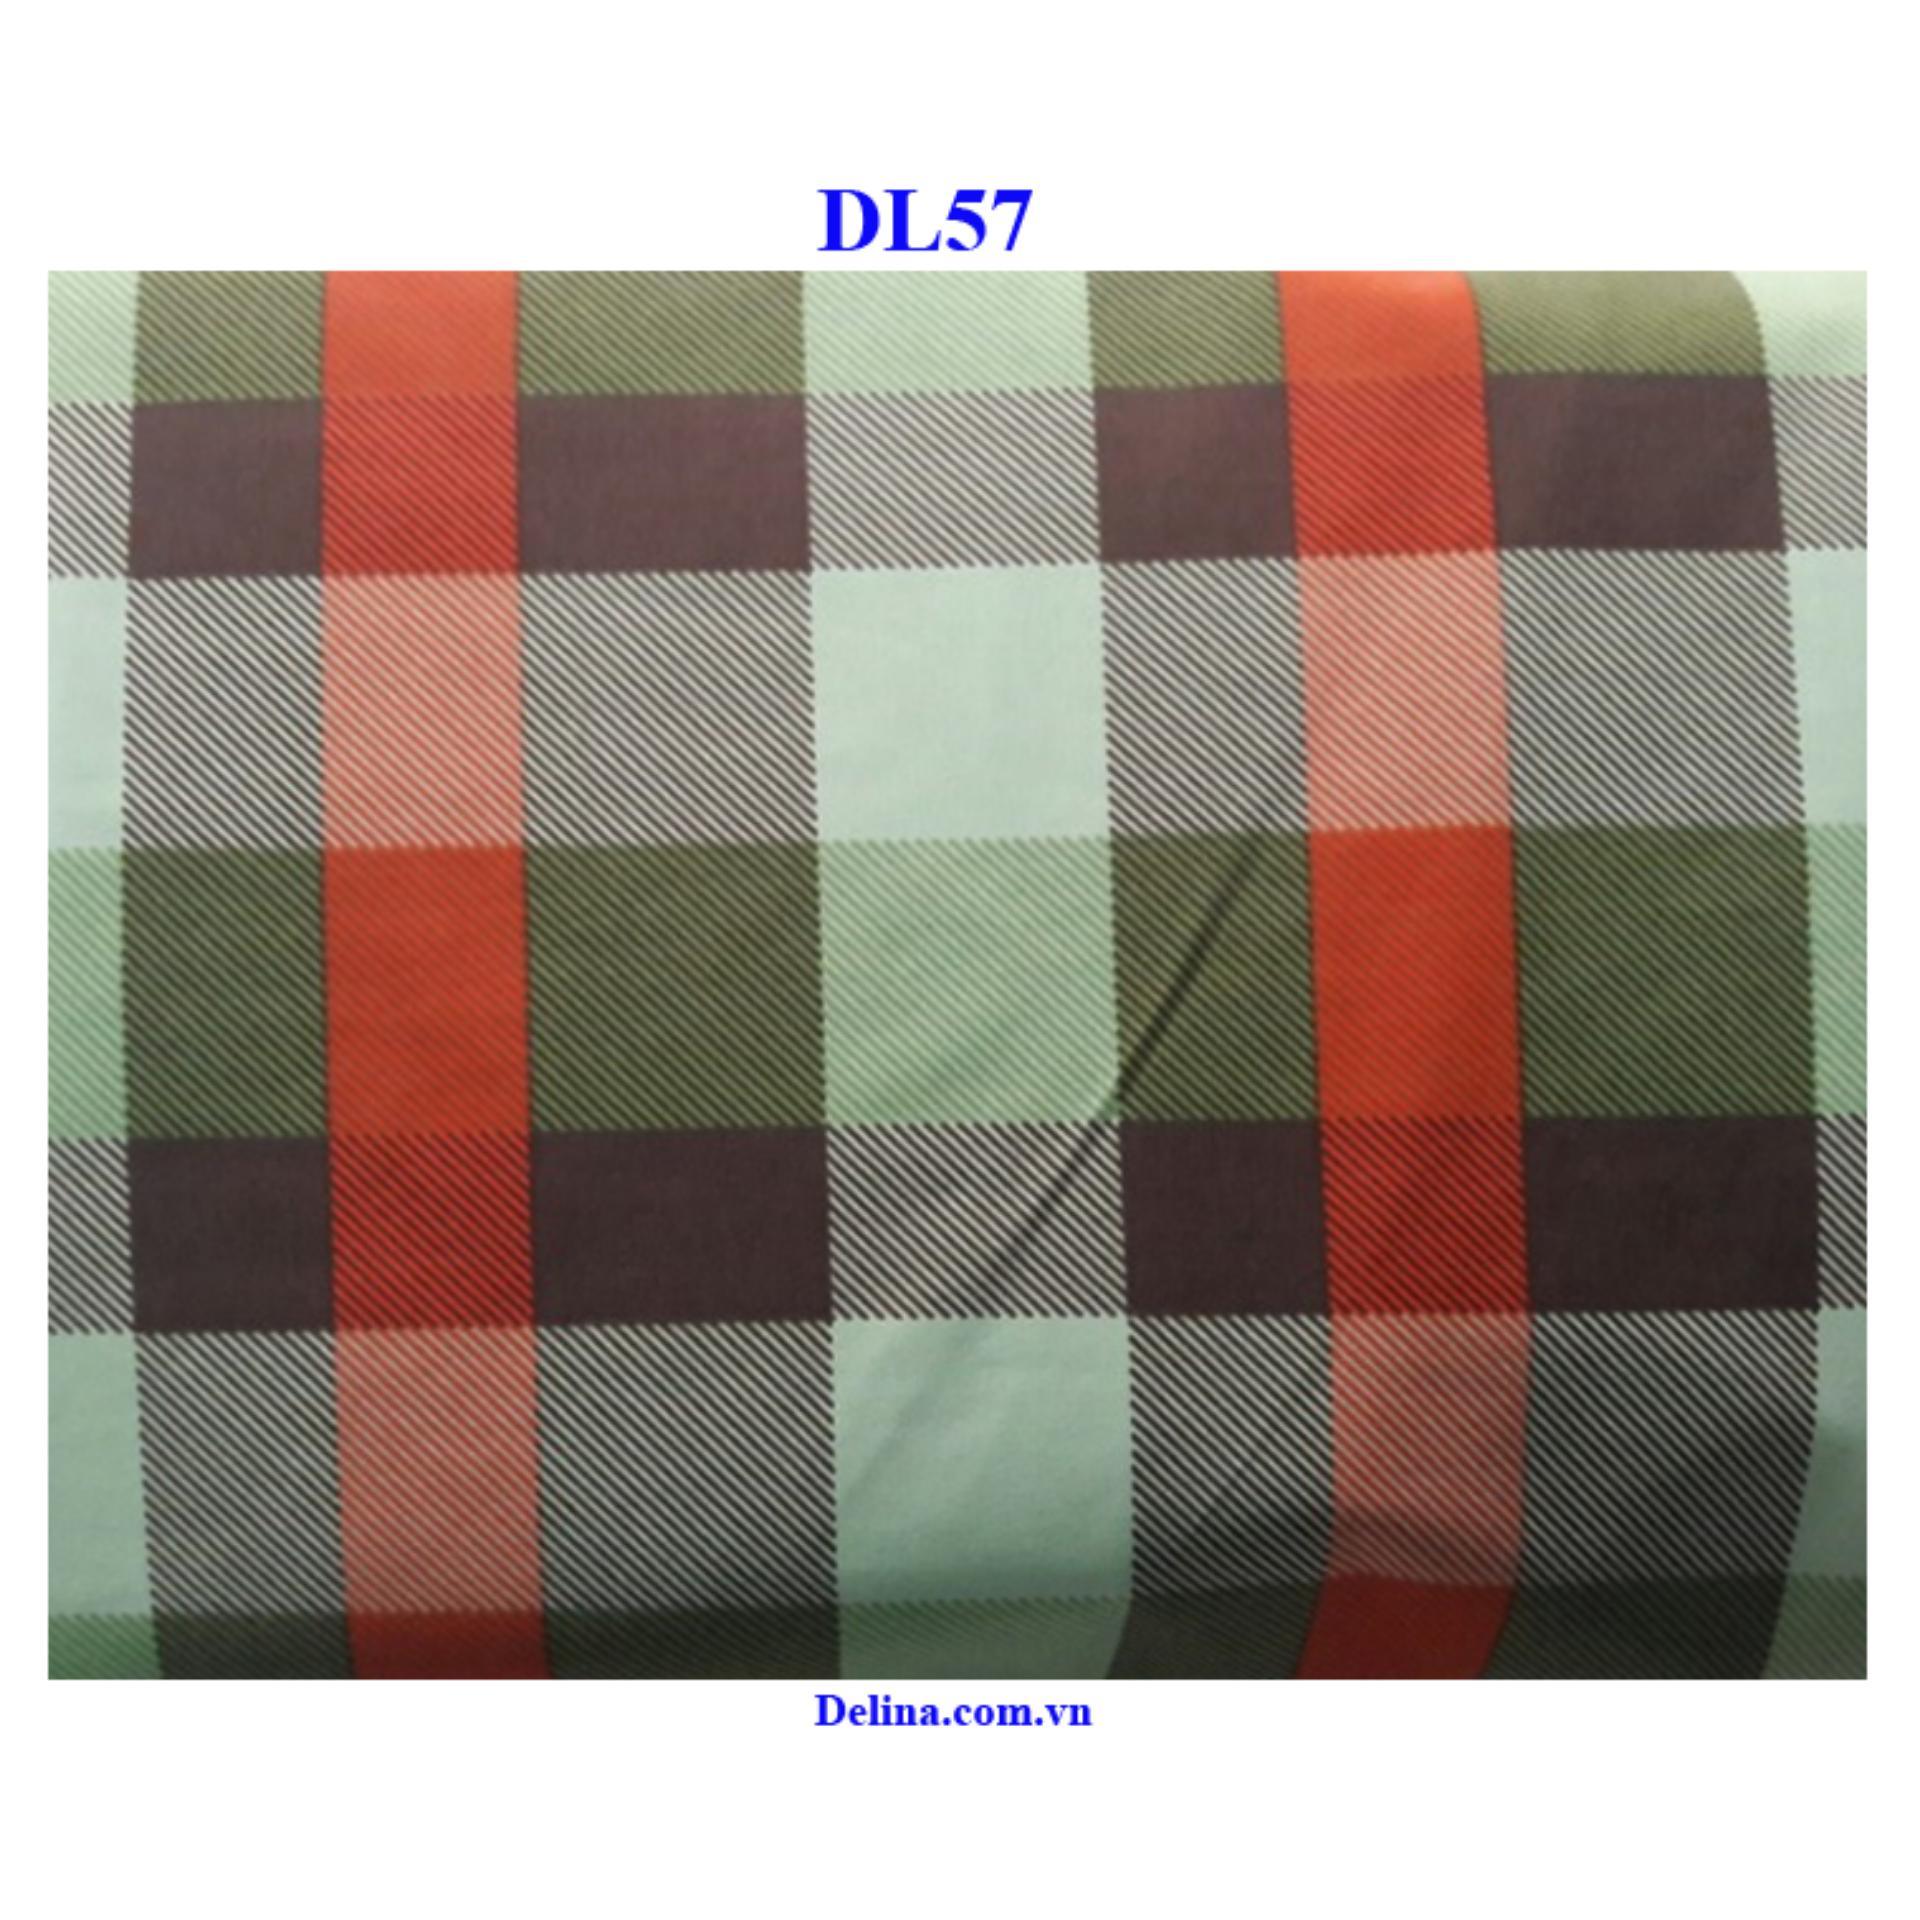 Ga chống thấm cao cấp DL57 loại 1m8x2mx10cm